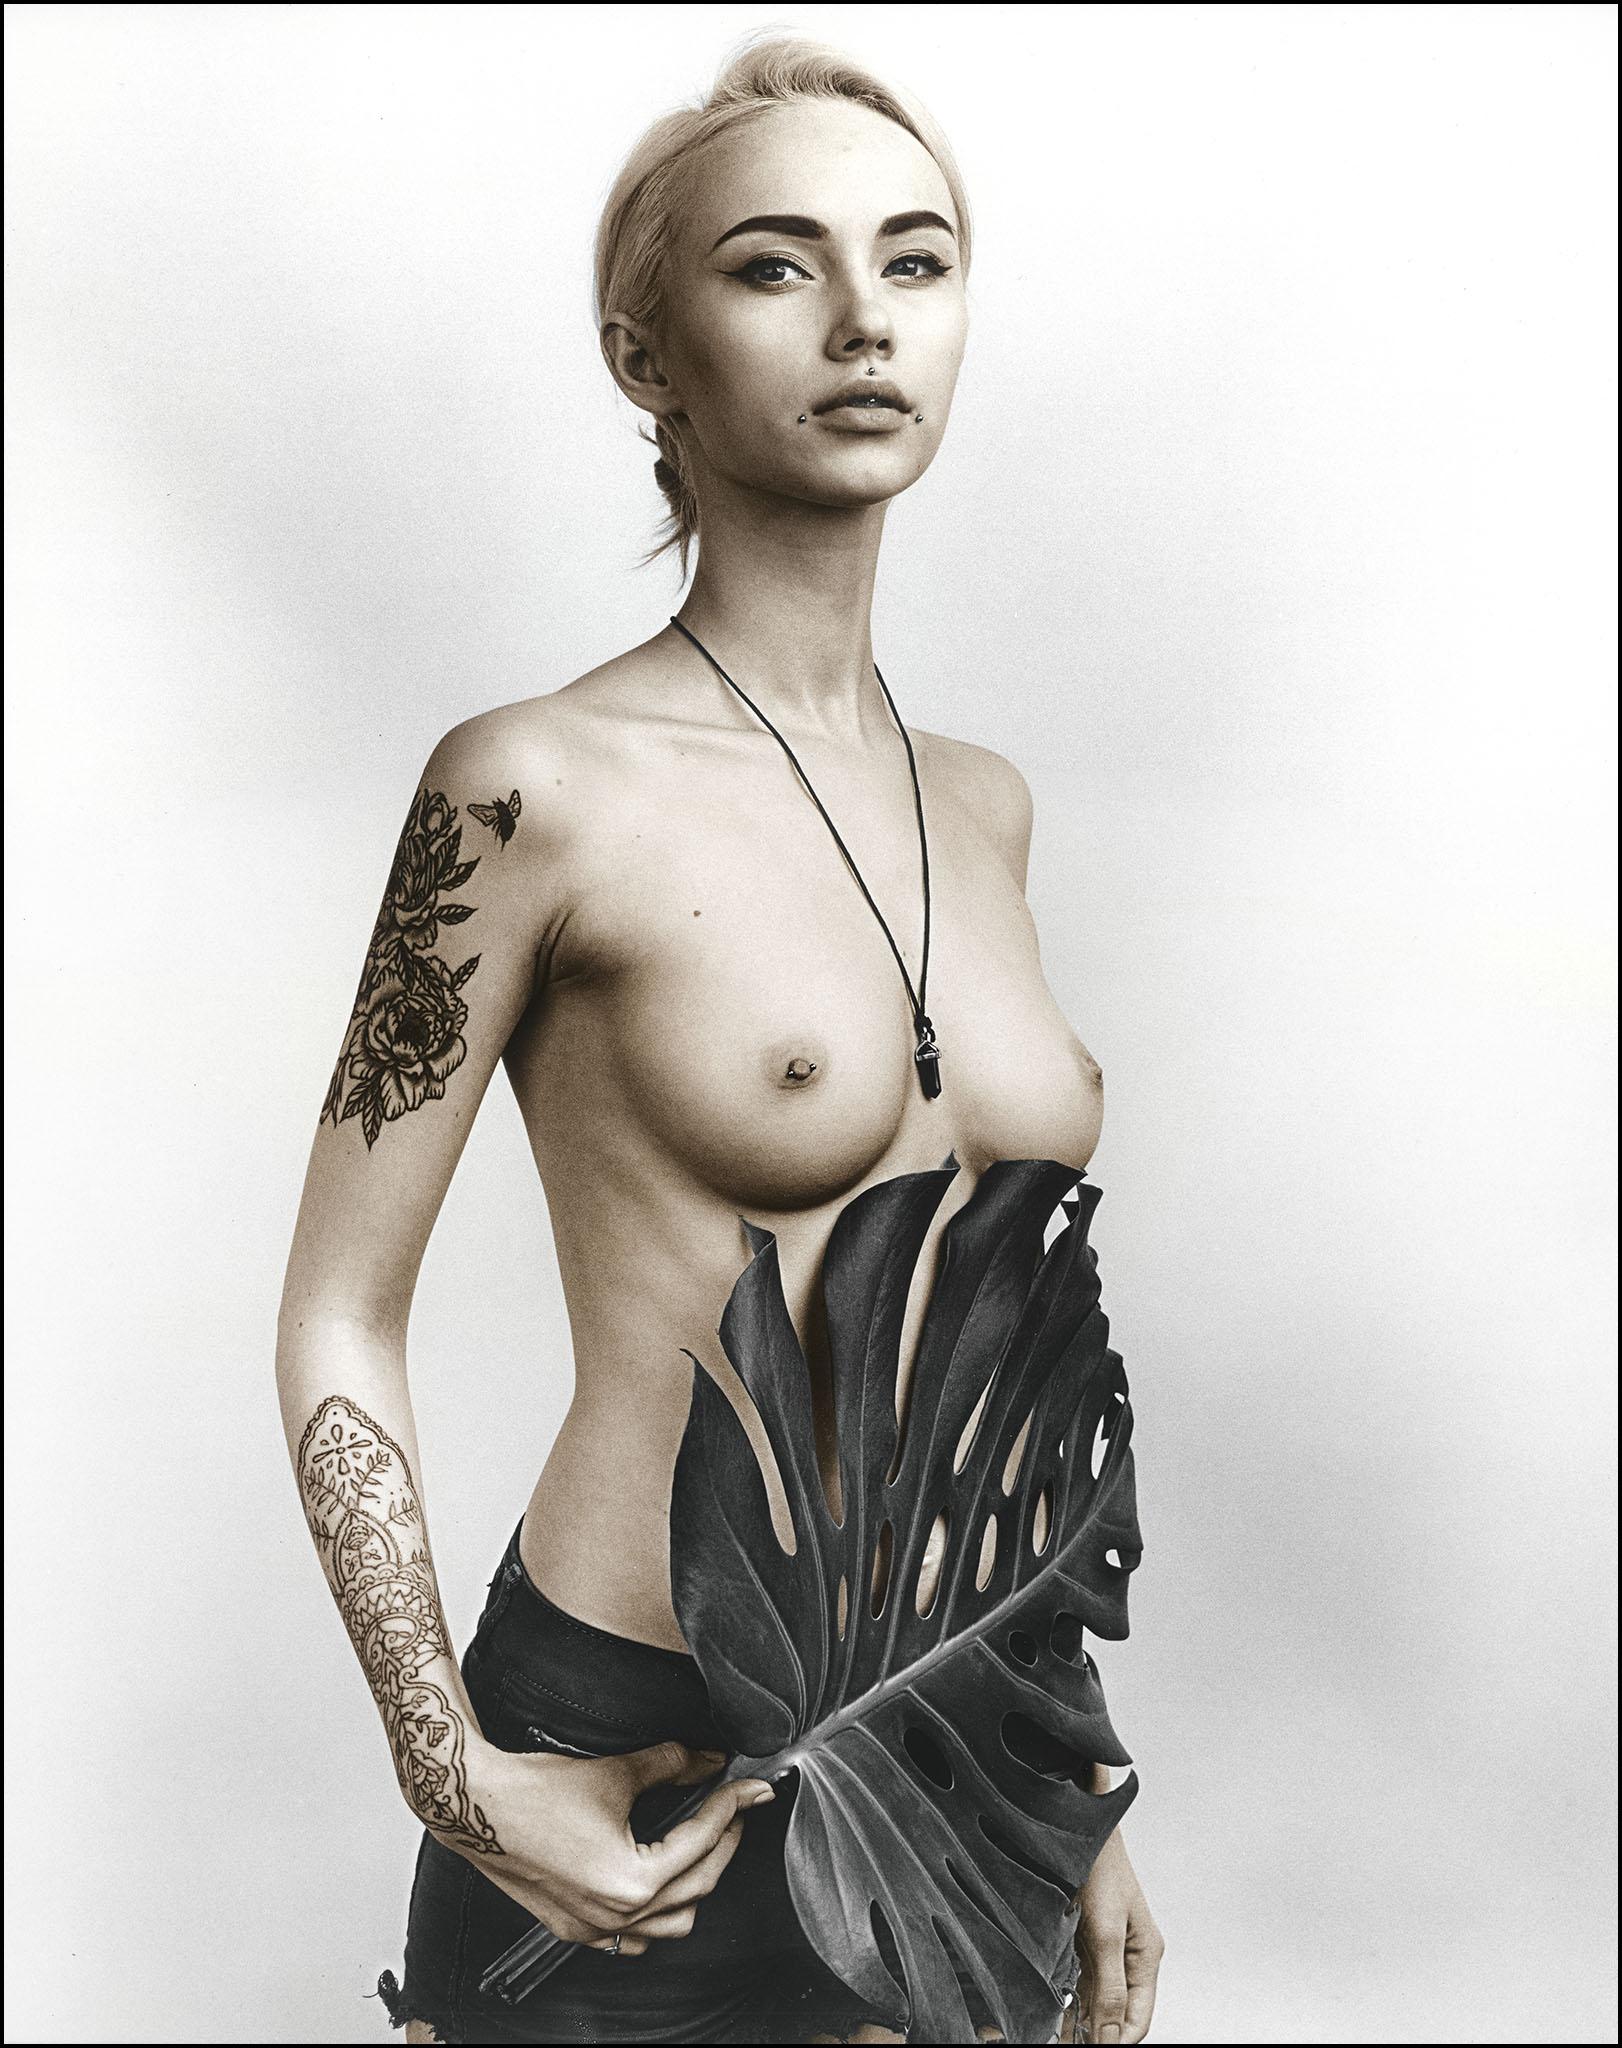 Larina M. - 2015